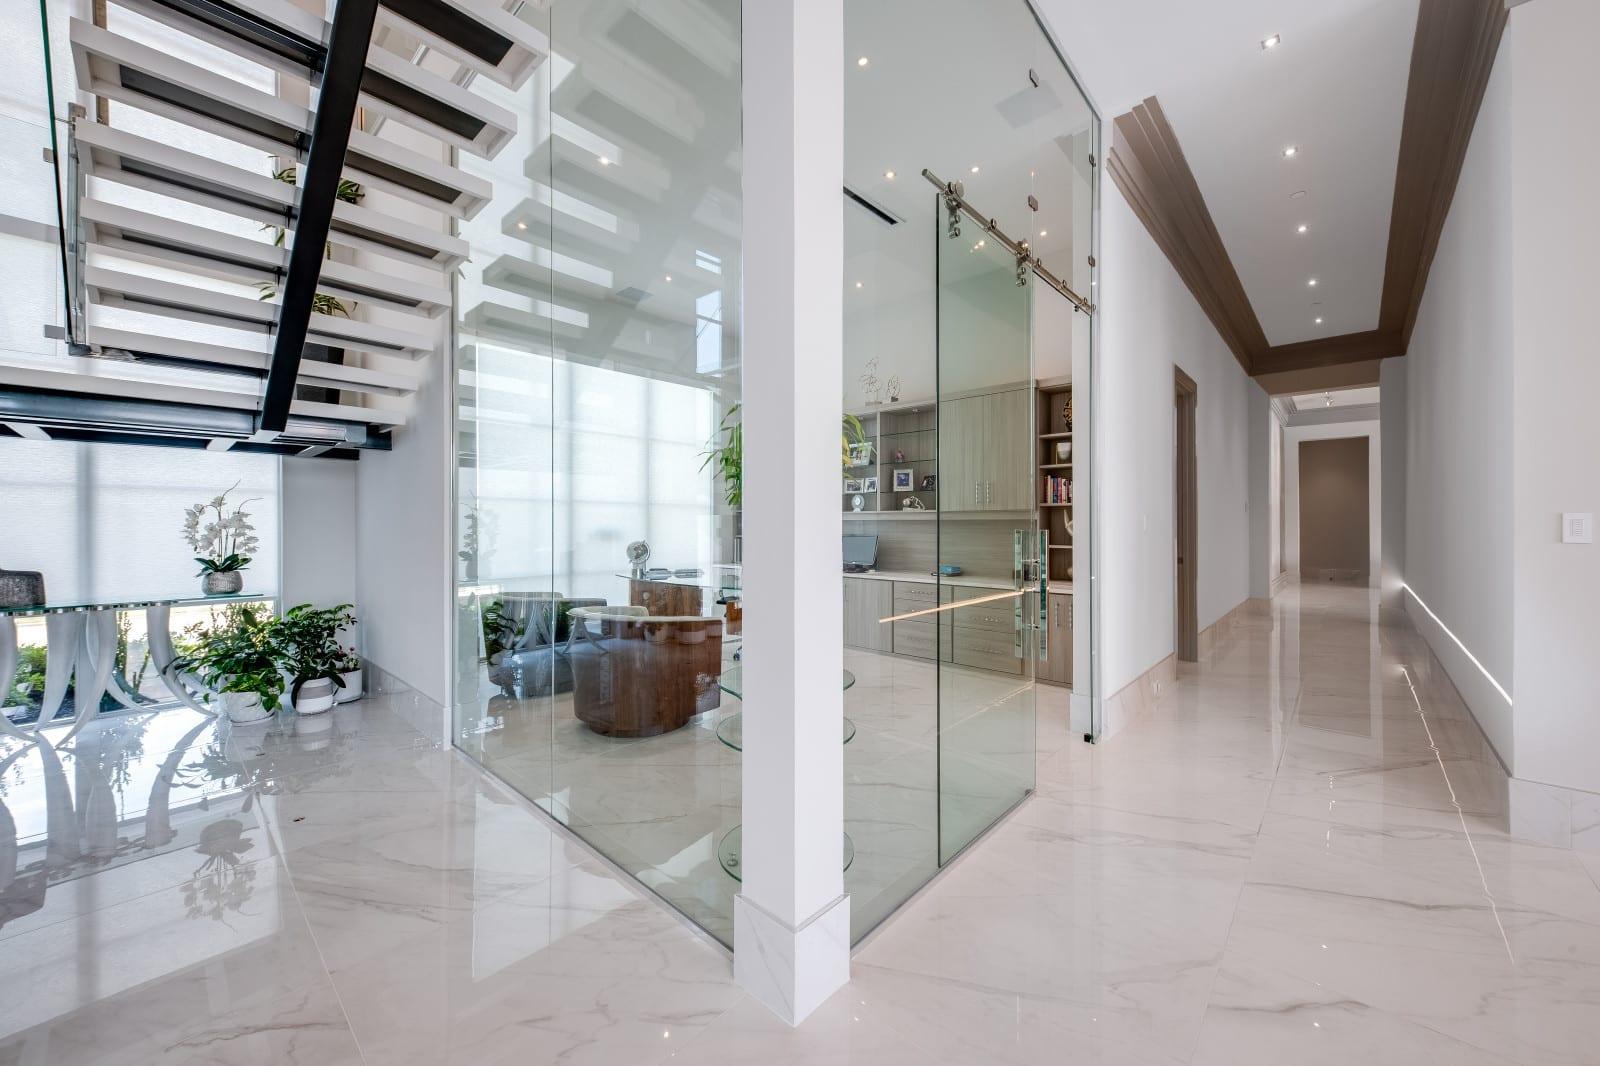 Custom Home Build and Interior Design # 16 - Millennial Design + Build, Custom Home Builders in Dallas Texas, modern style homes, Property Evaluator, Interior Designers, using BIM Technology and Home 3D Model.